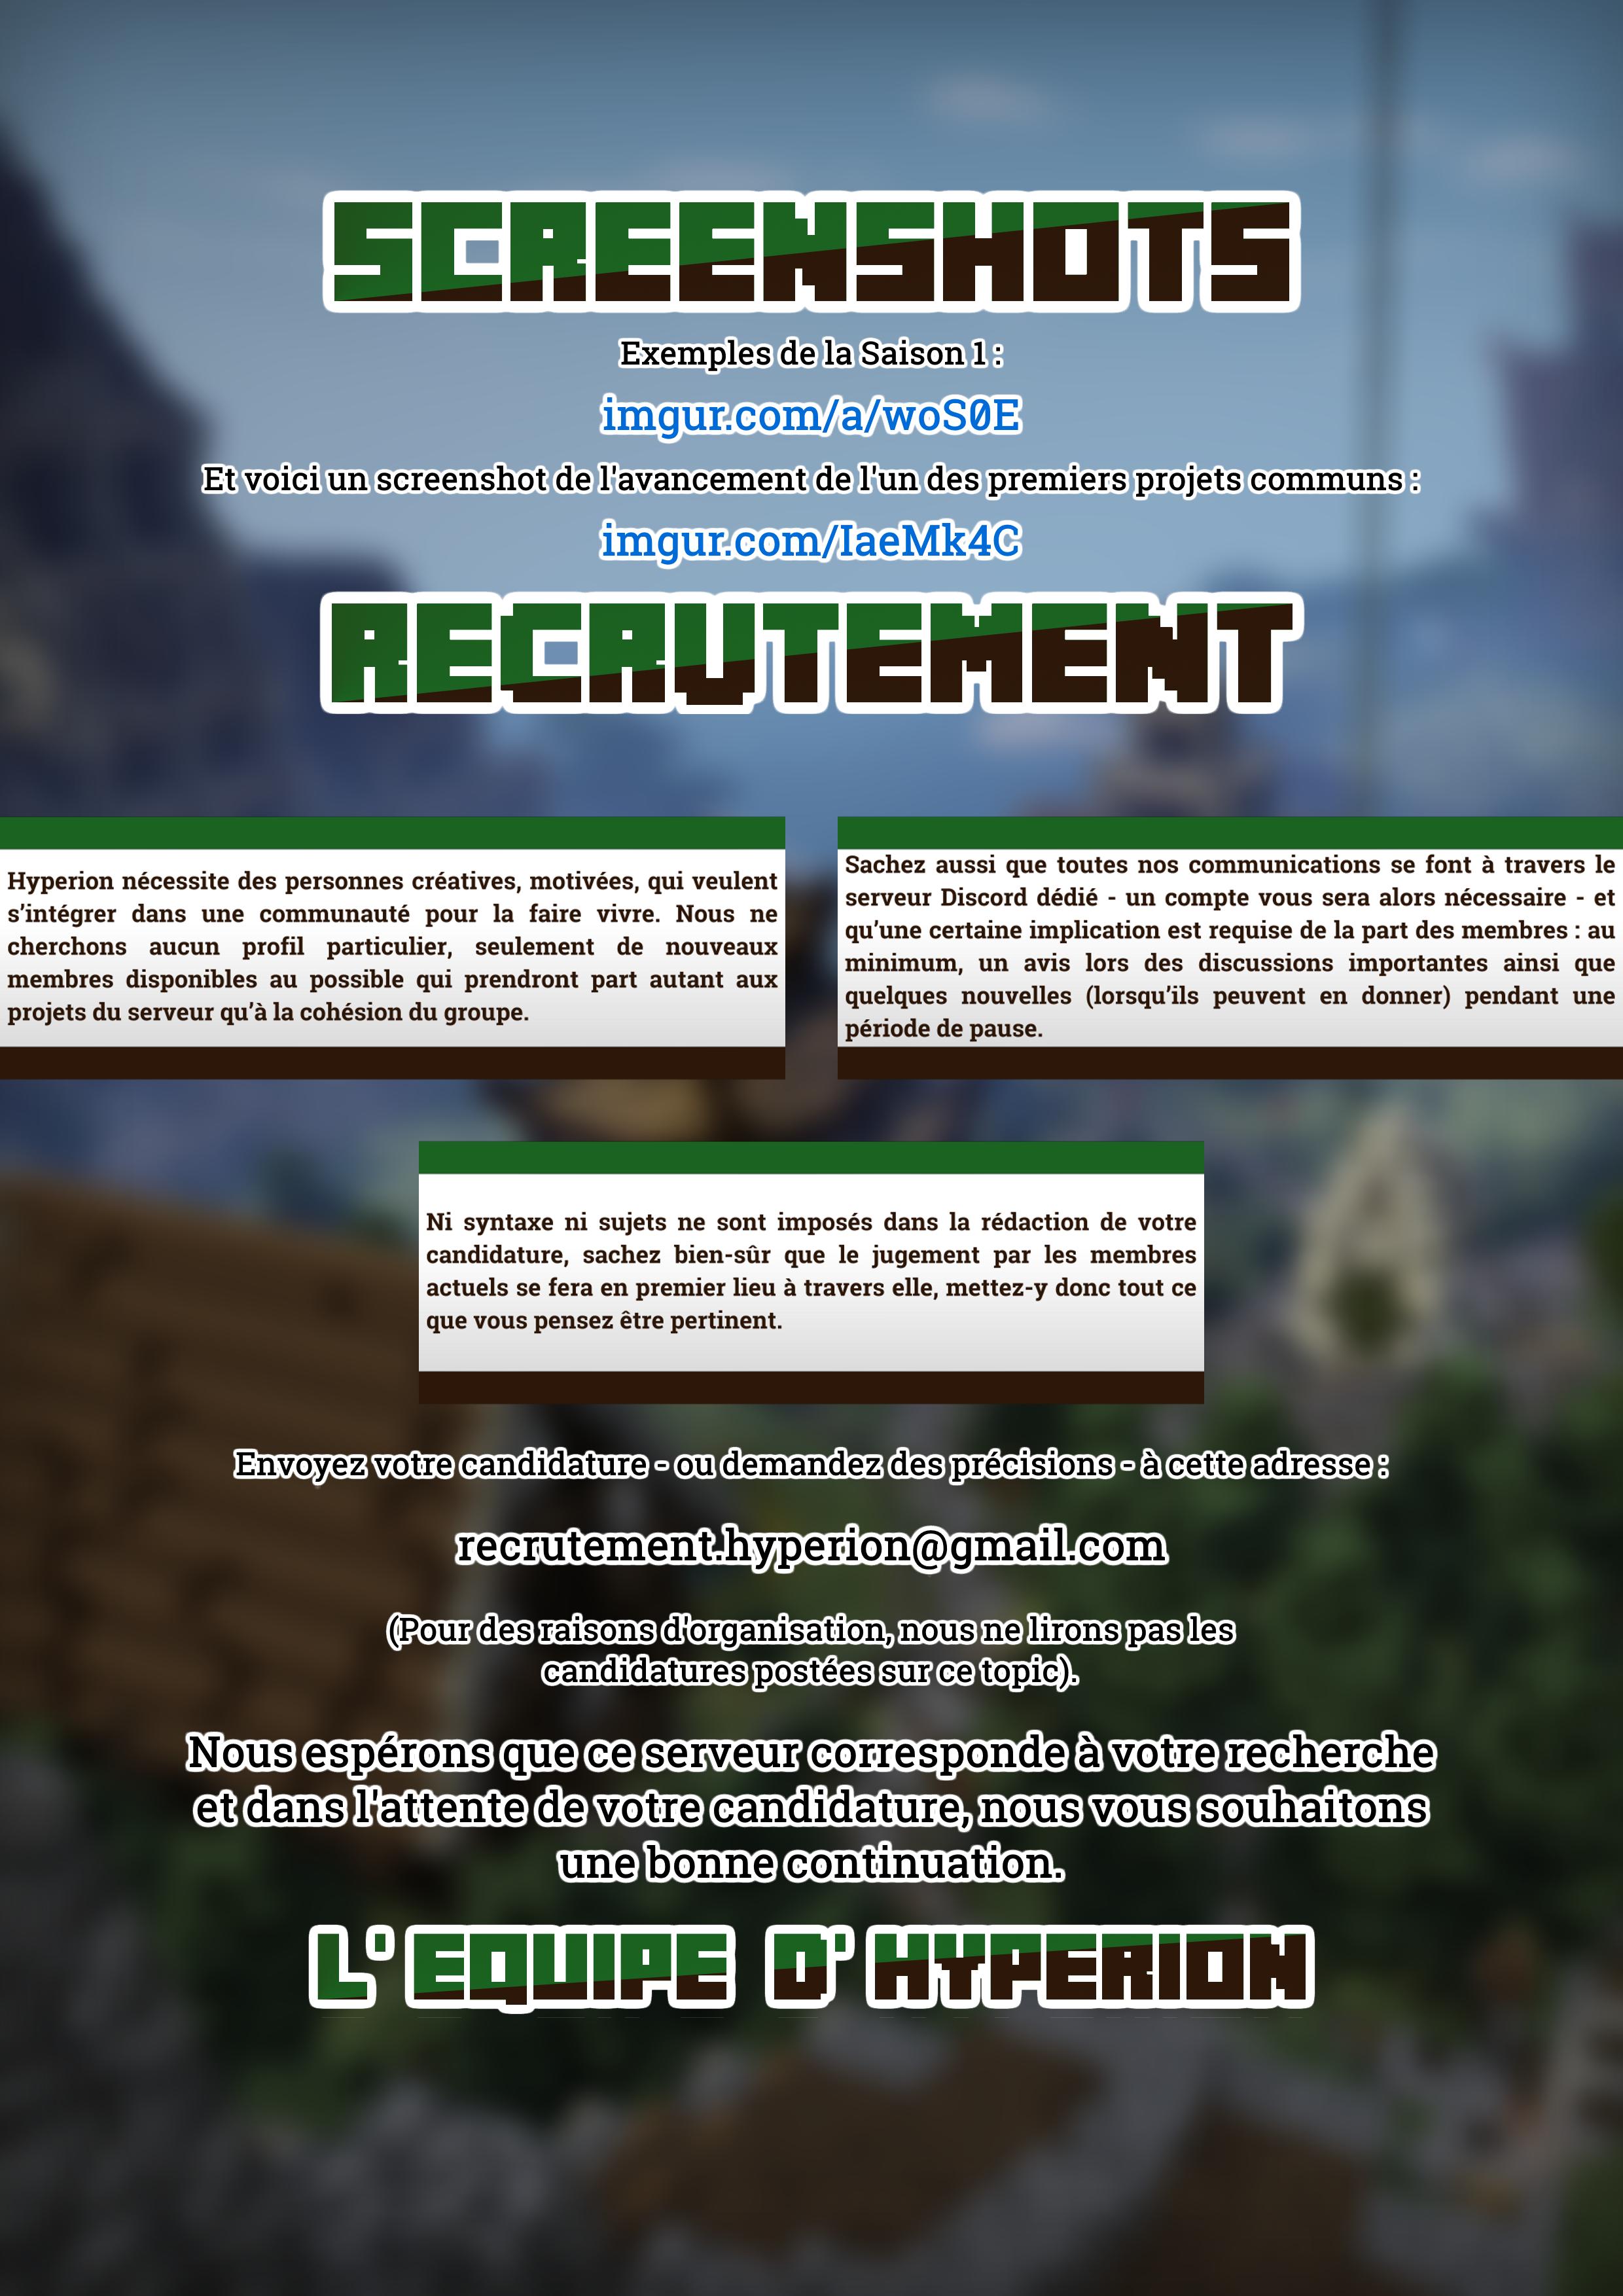 Recrutement_2.png